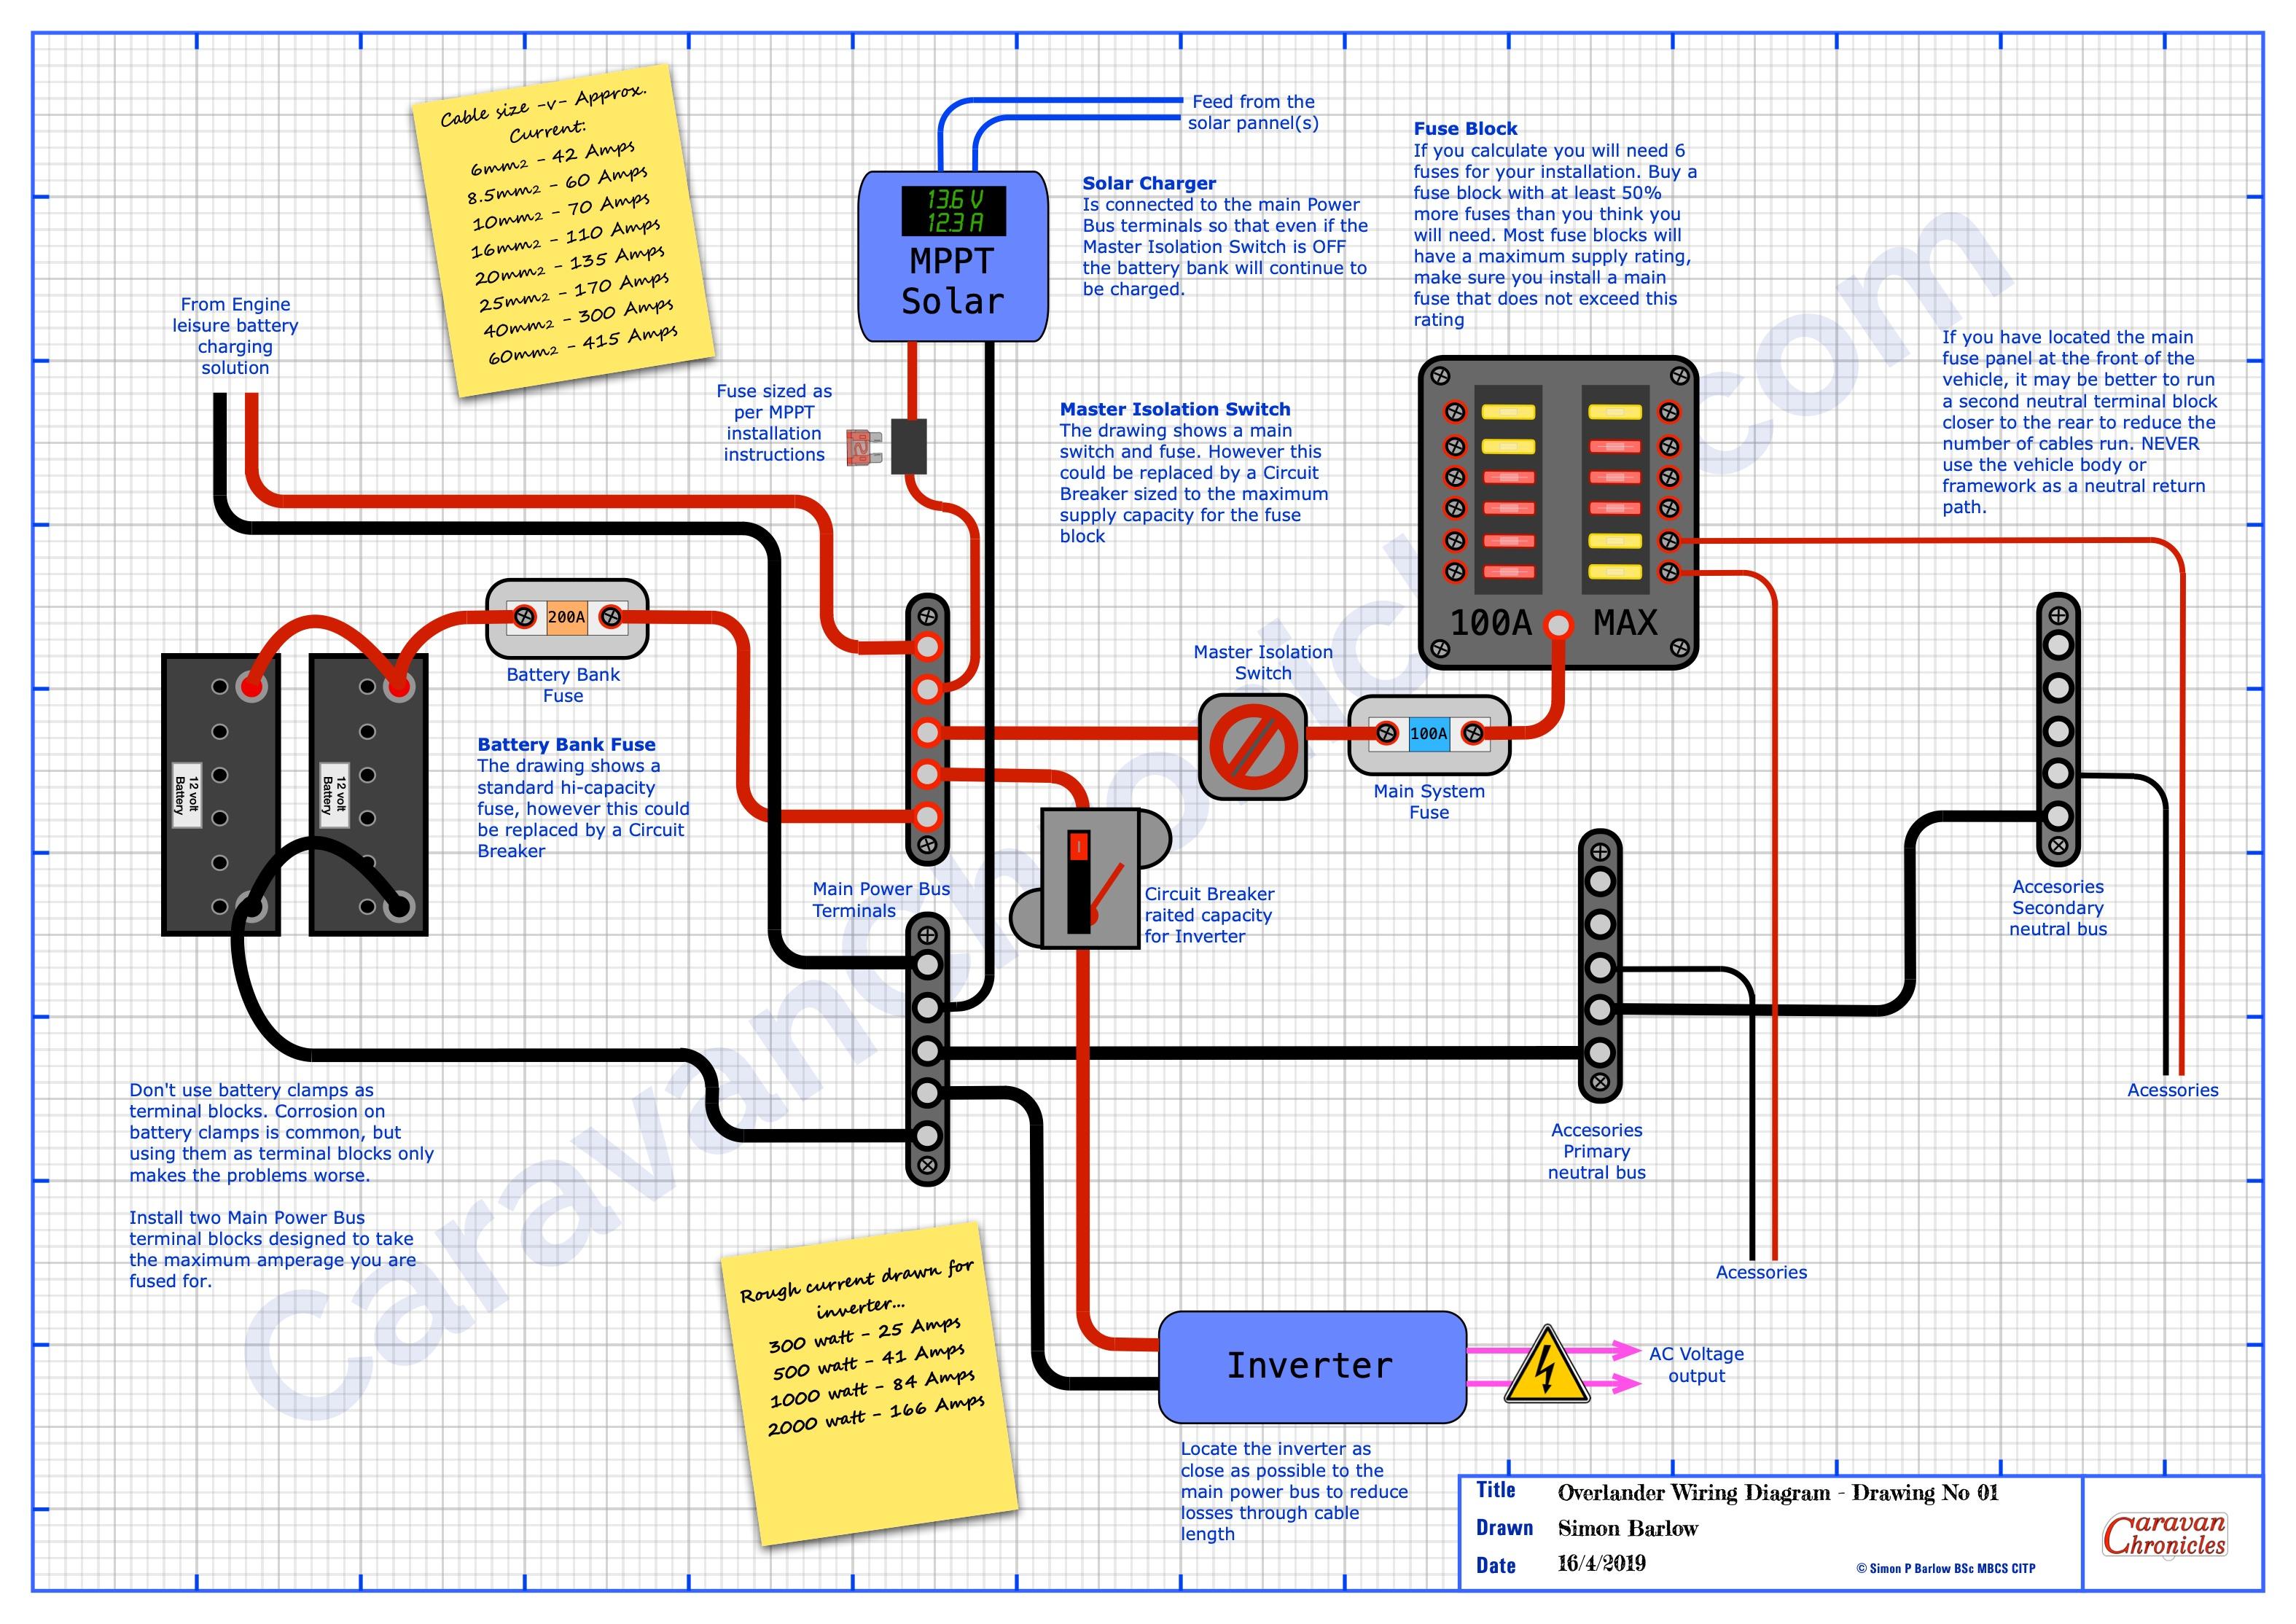 Overlander Wiring Diagram - 01